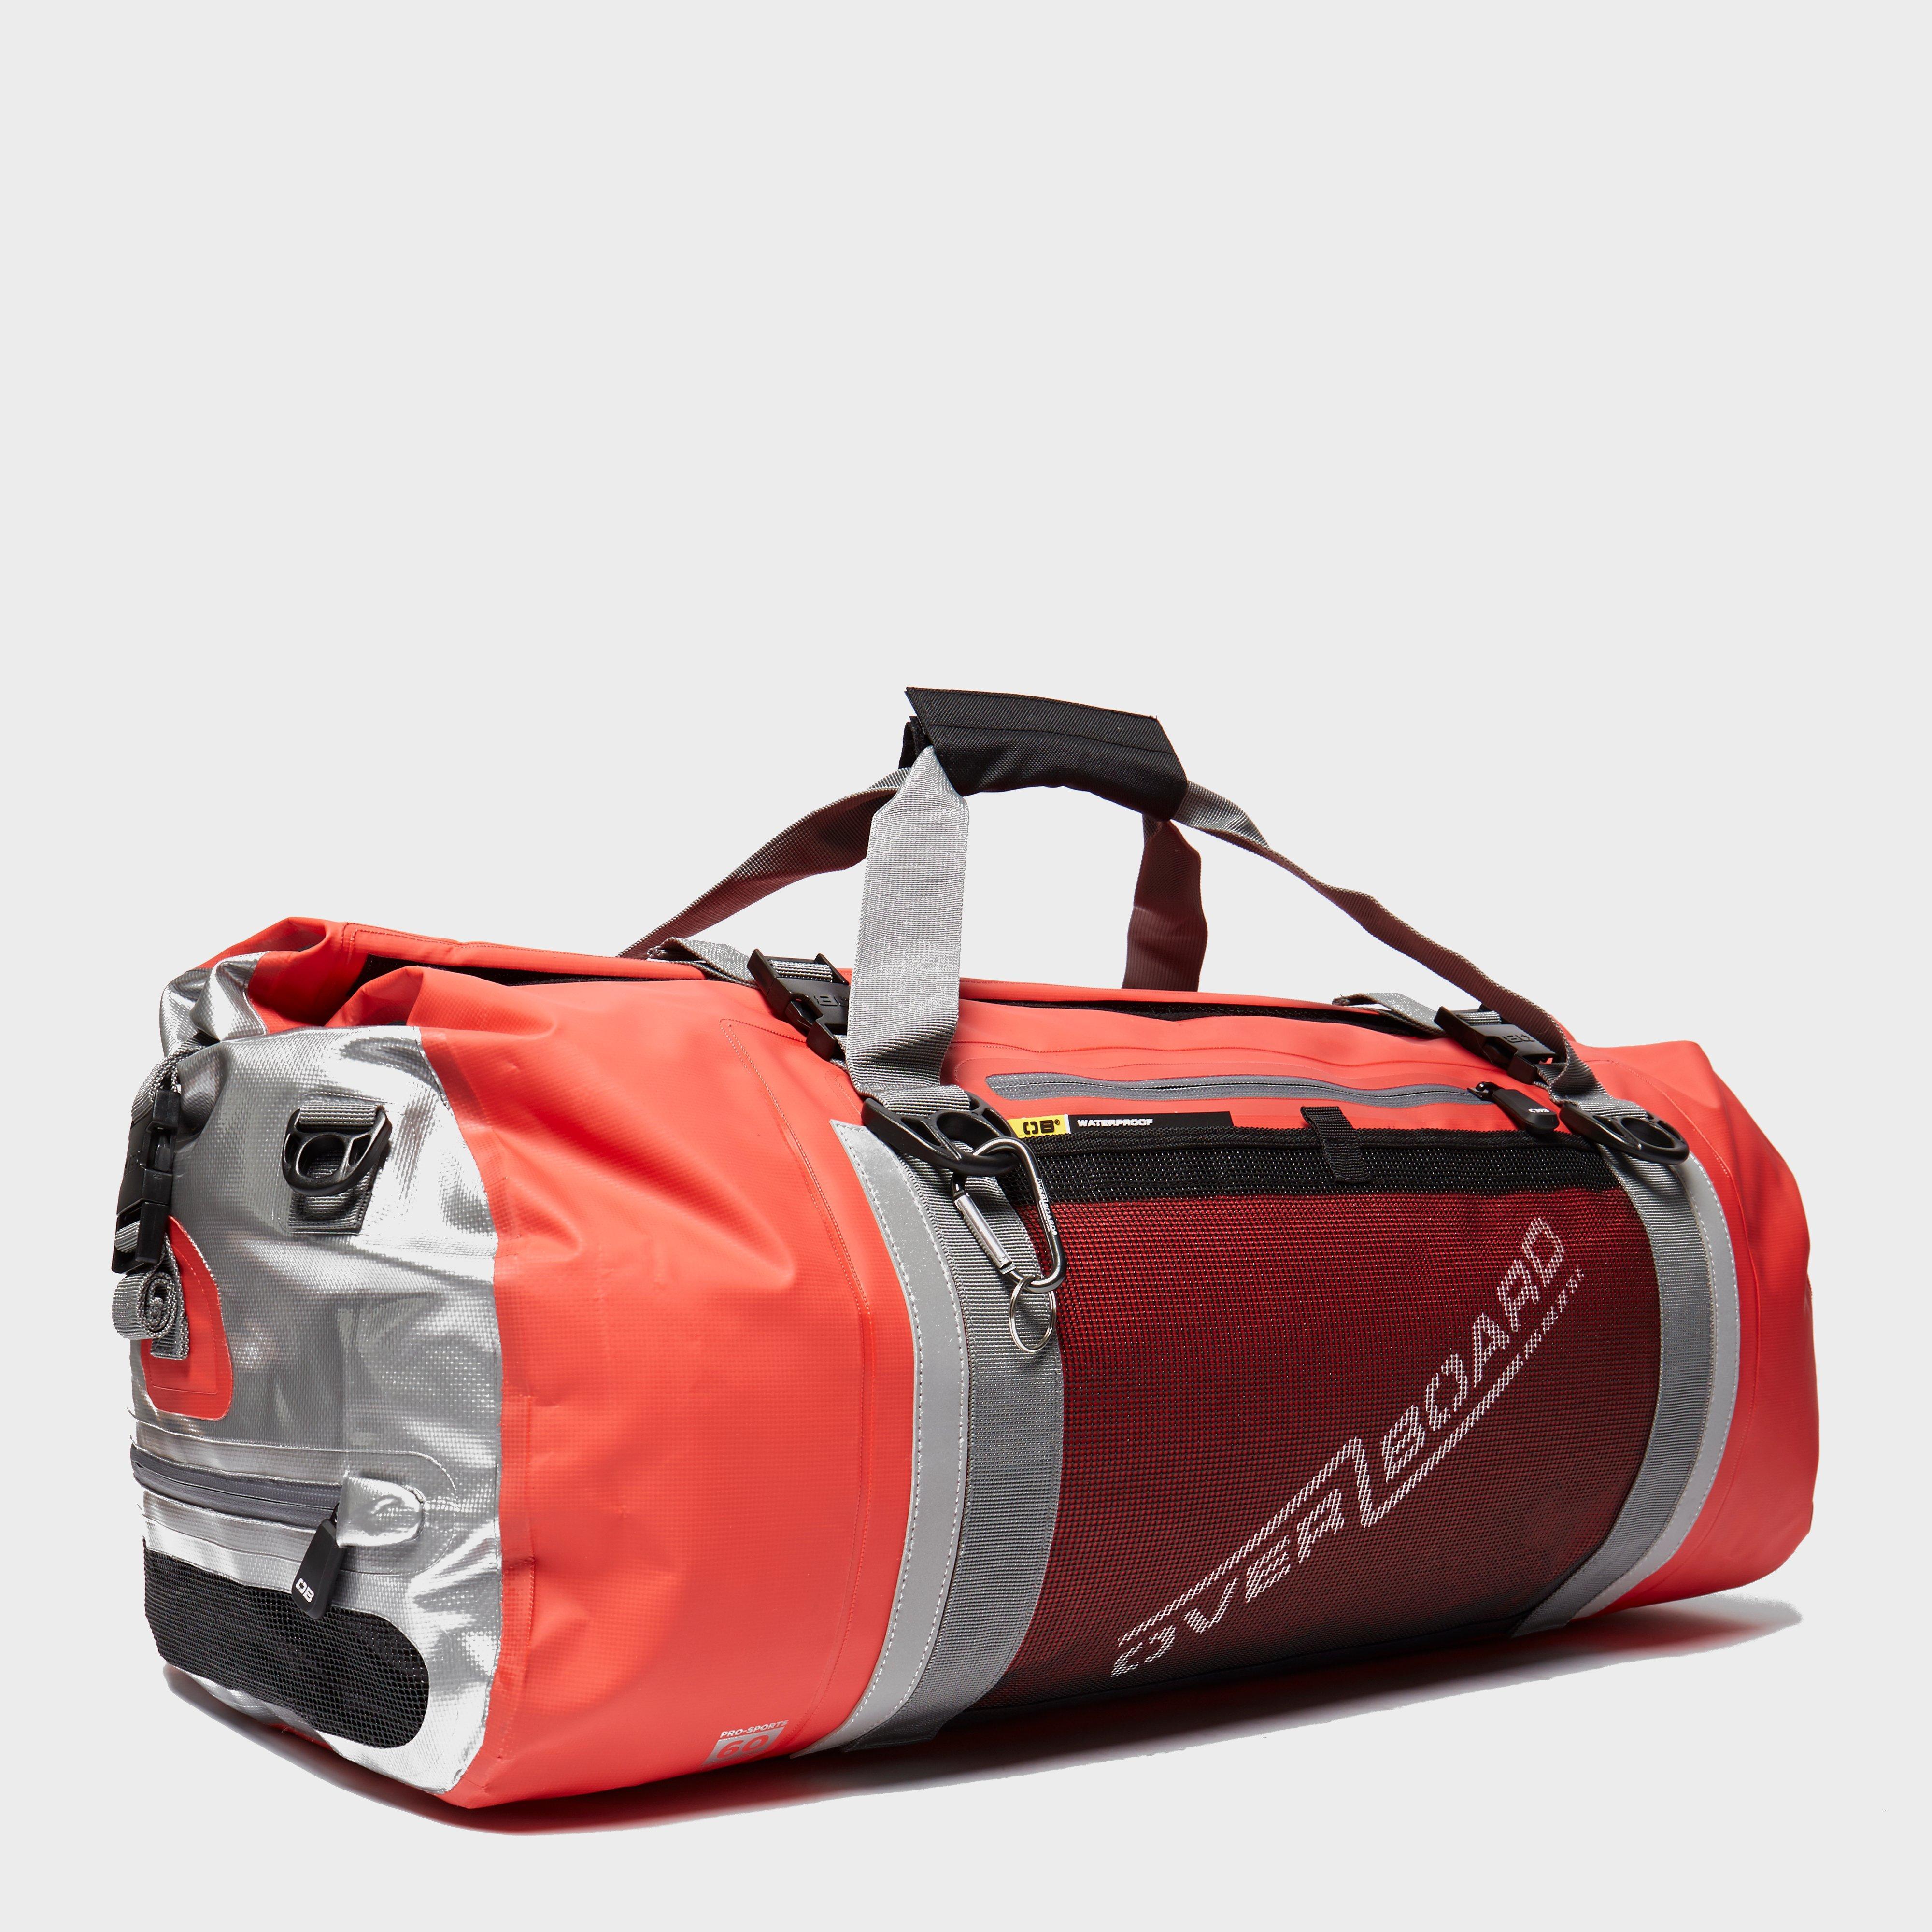 5e71d42b48 Overboard Pro-Sports Waterproof 60L Duffel Bag